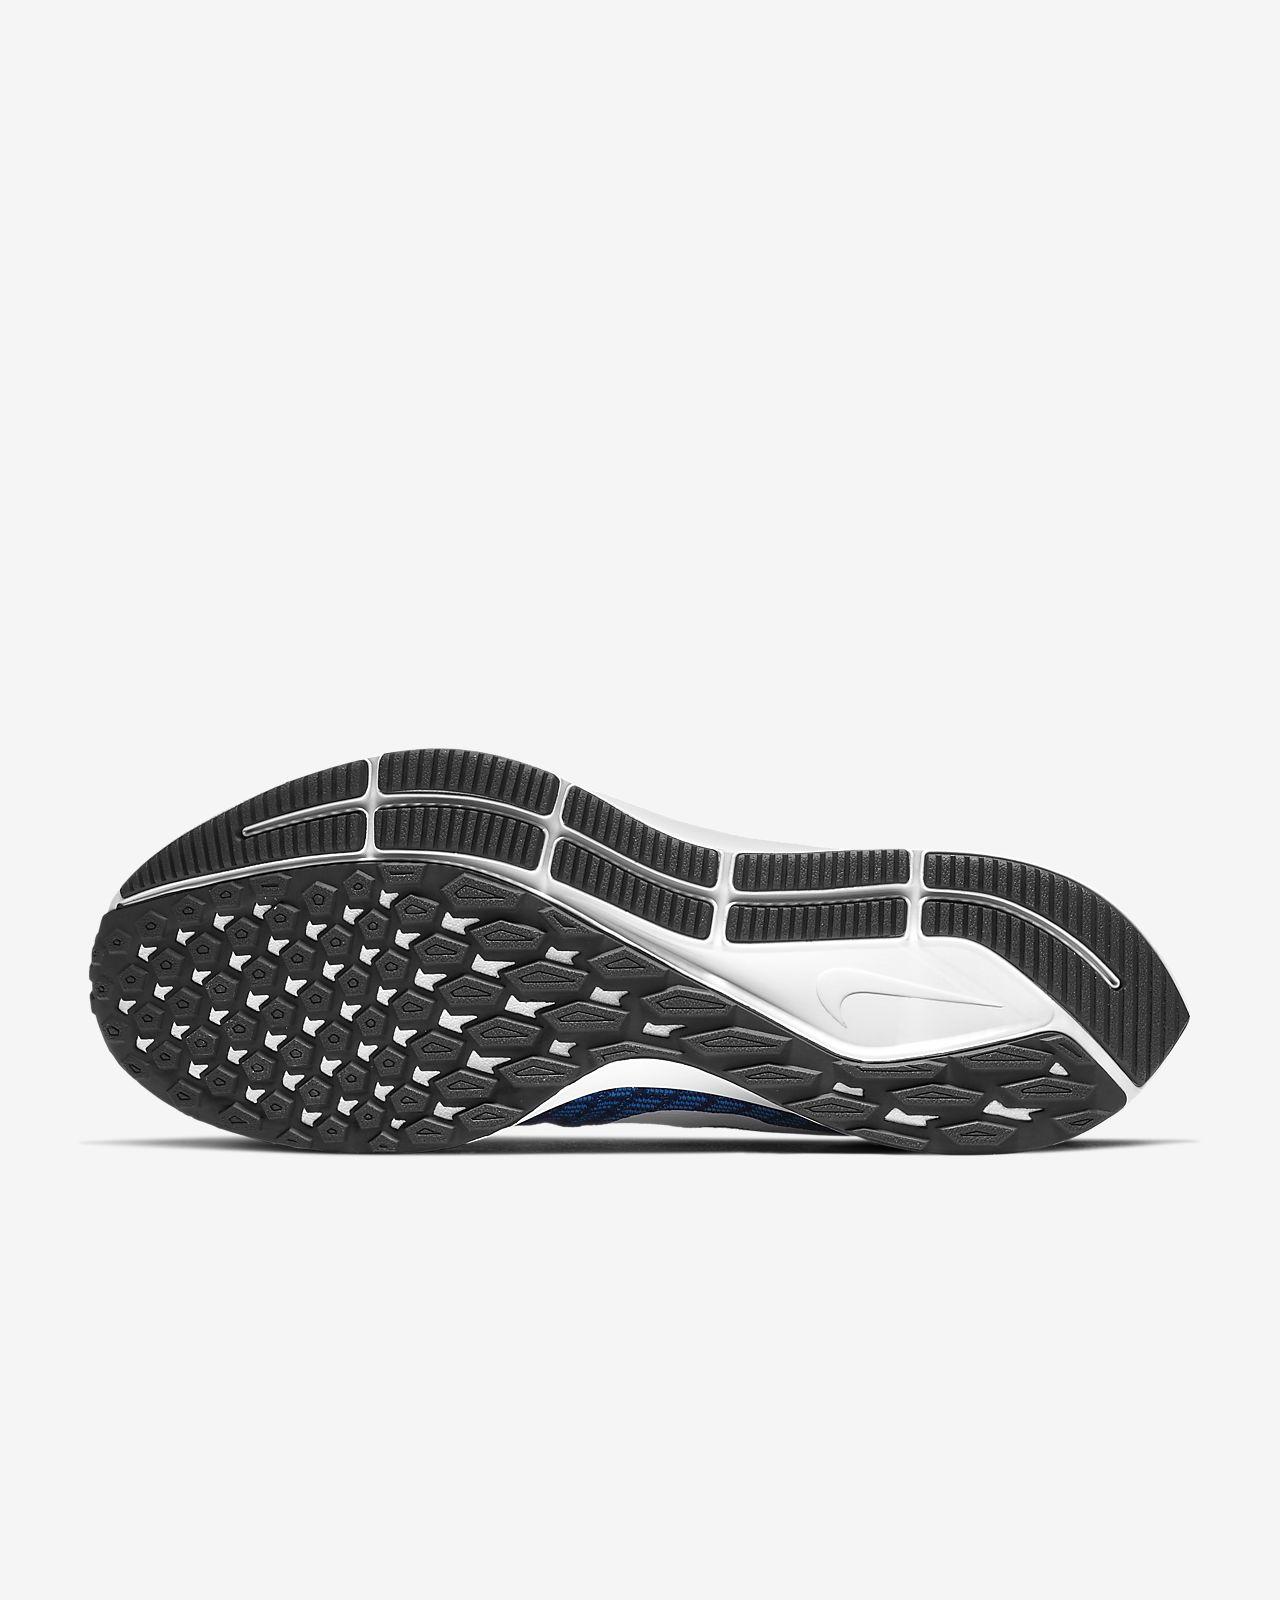 9666f19e7 Nike Air Zoom Pegasus 35 Zapatillas de running - Hombre. Nike.com ES